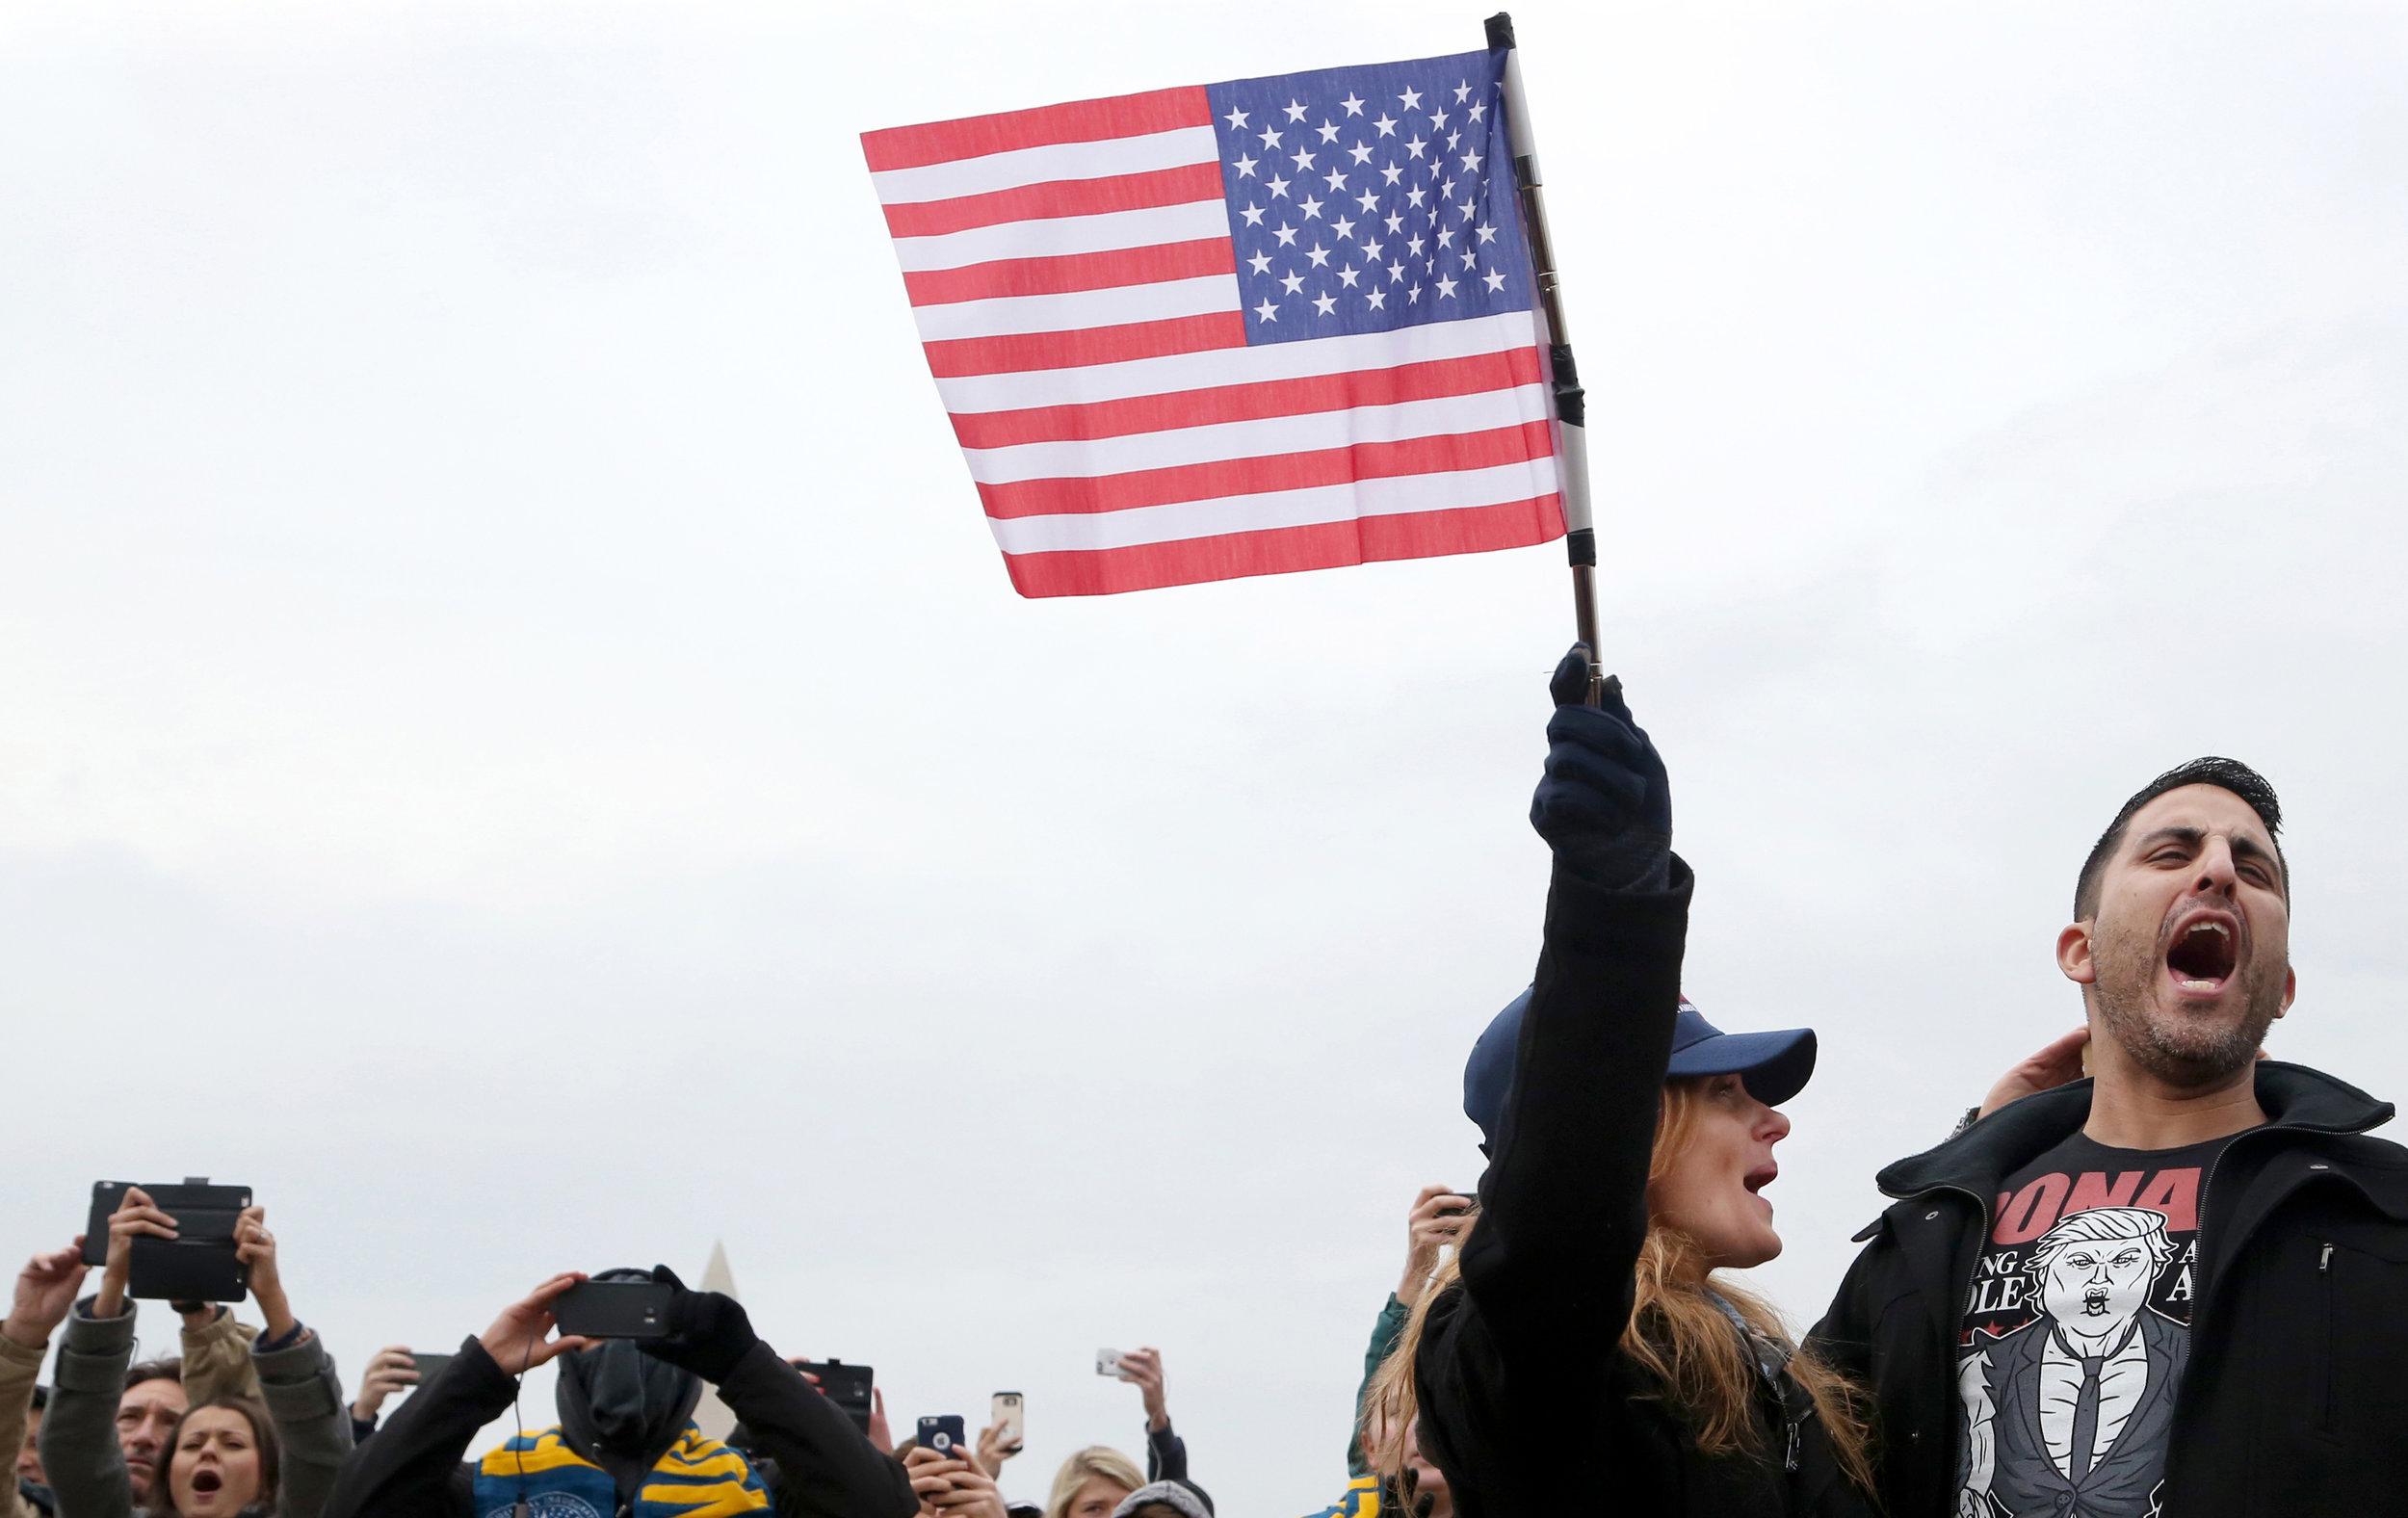 7_inauguration_caitlinfaw_flag waving.3.jpg